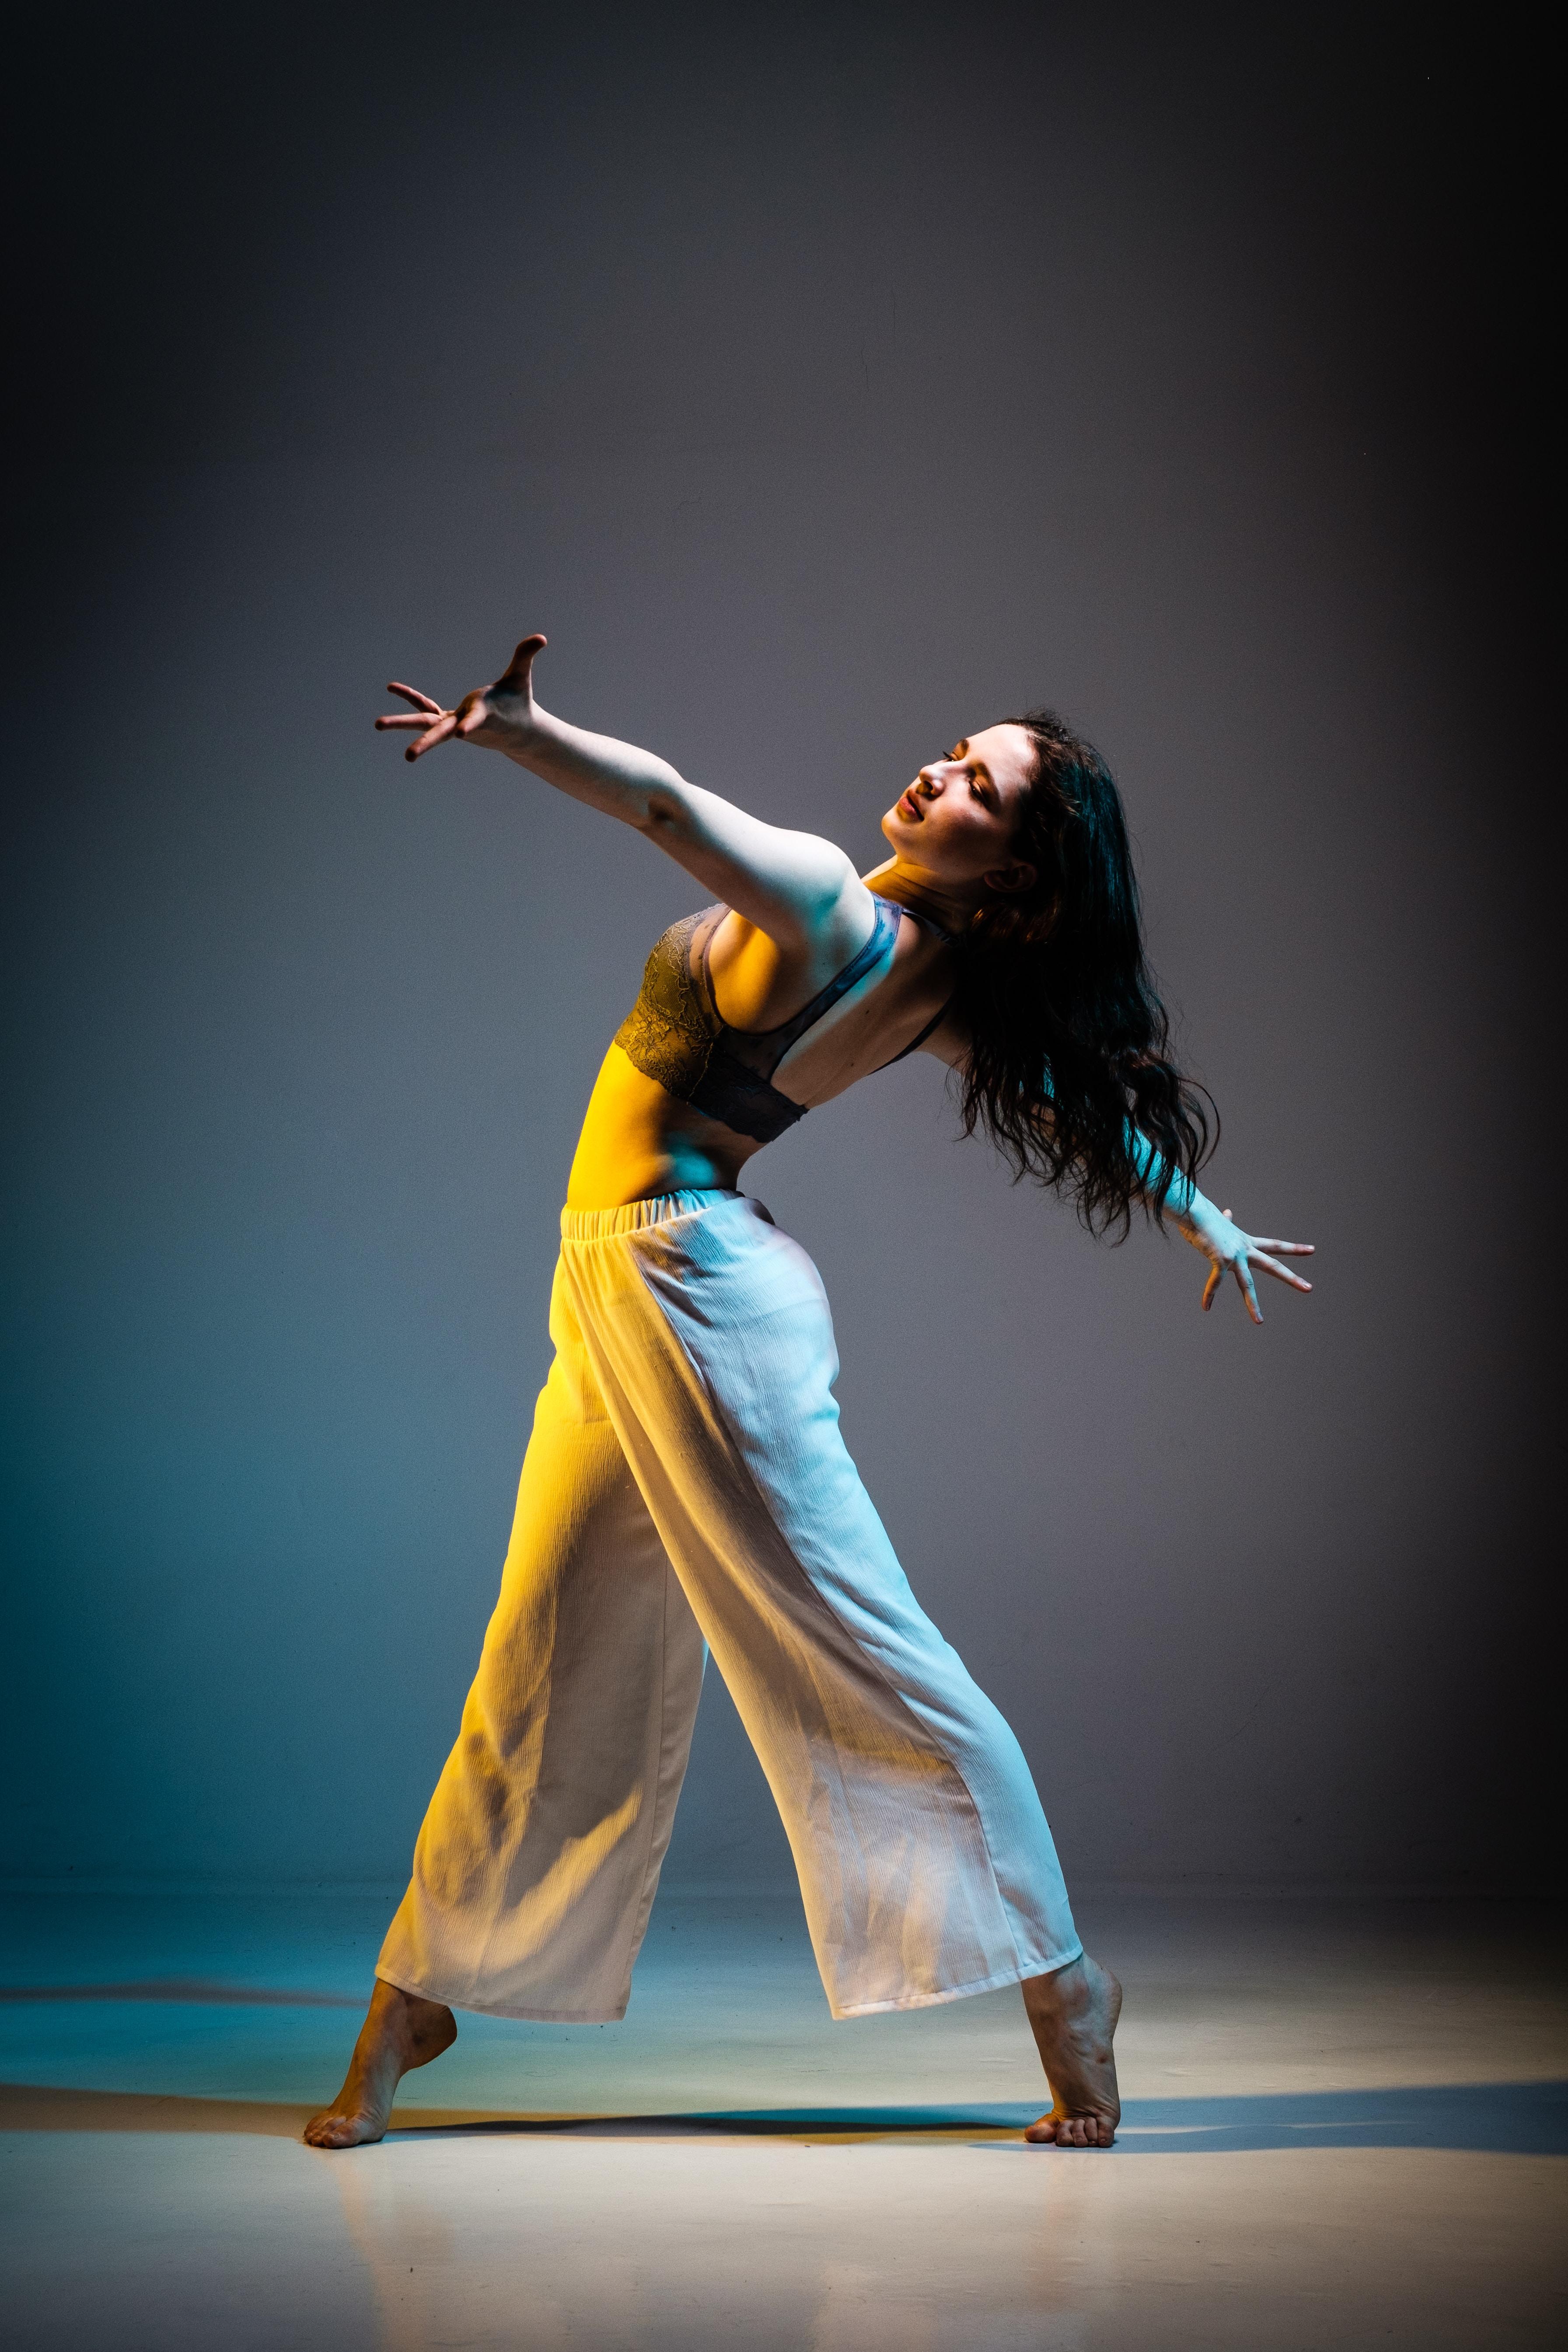 women's orange and blue sleeveless dress